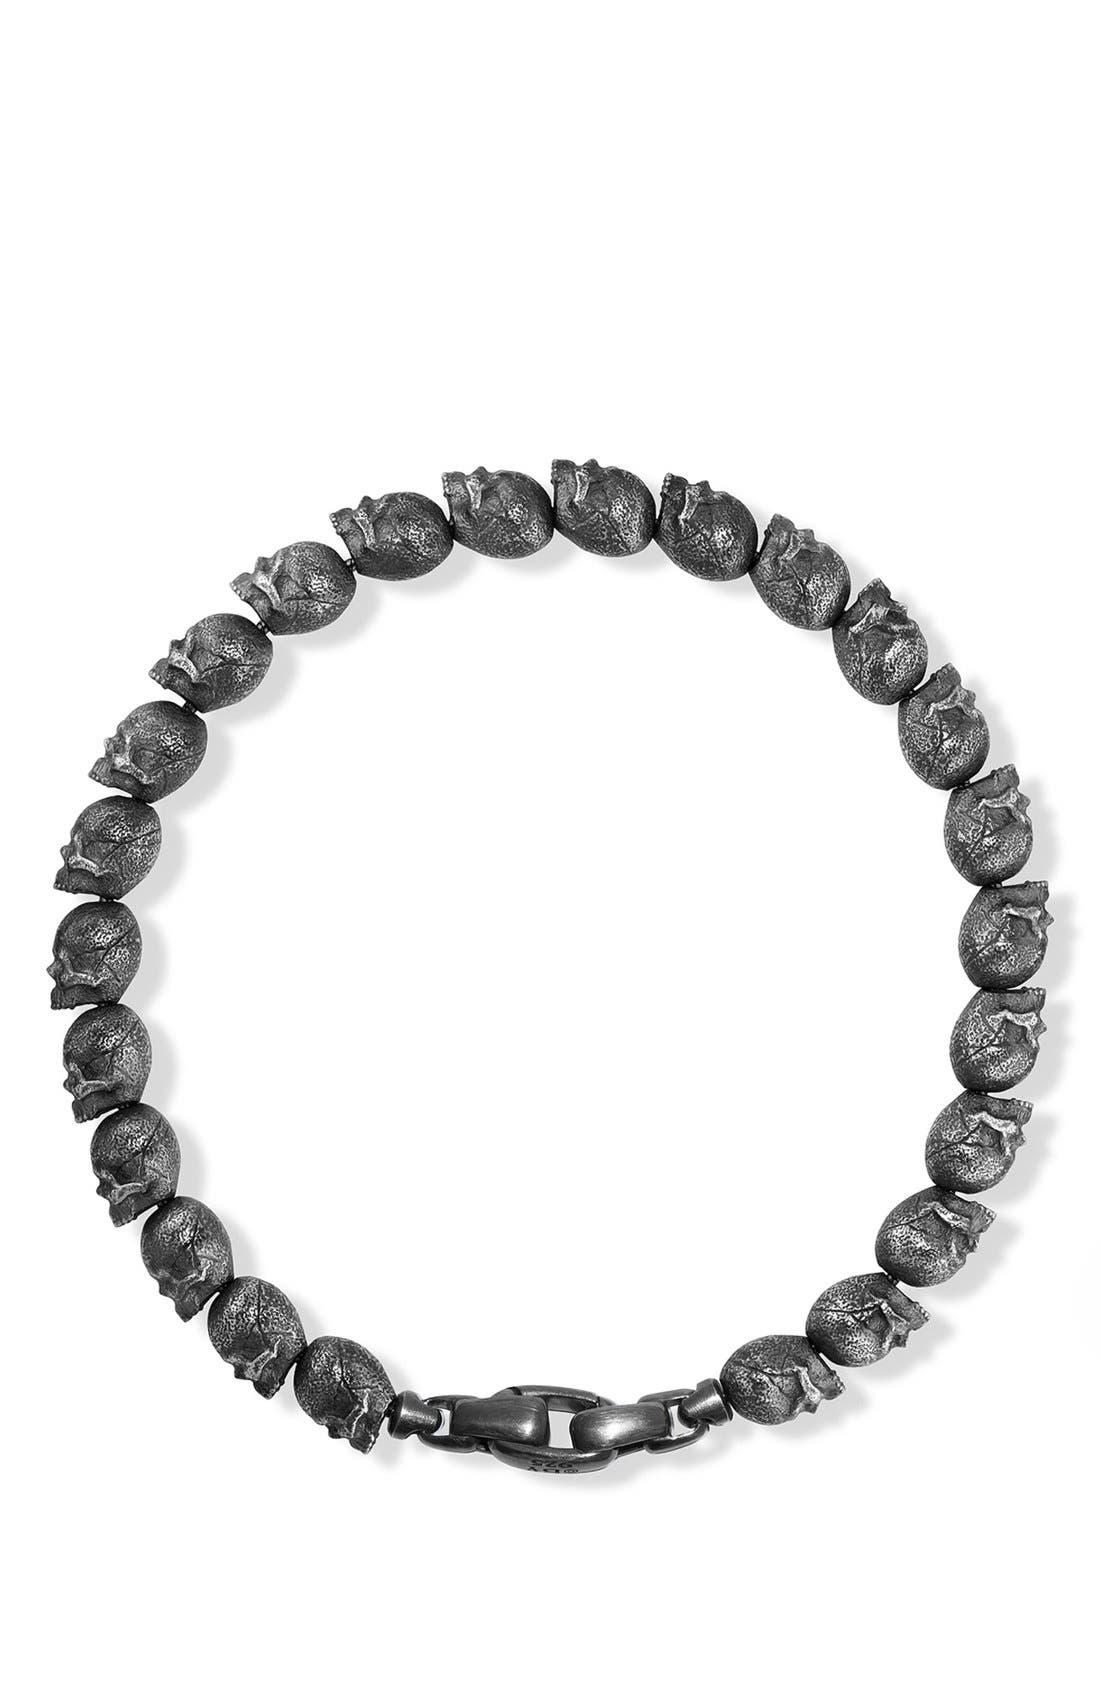 'Spiritual Beads' Bracelet in Silver,                             Alternate thumbnail 2, color,                             Silver